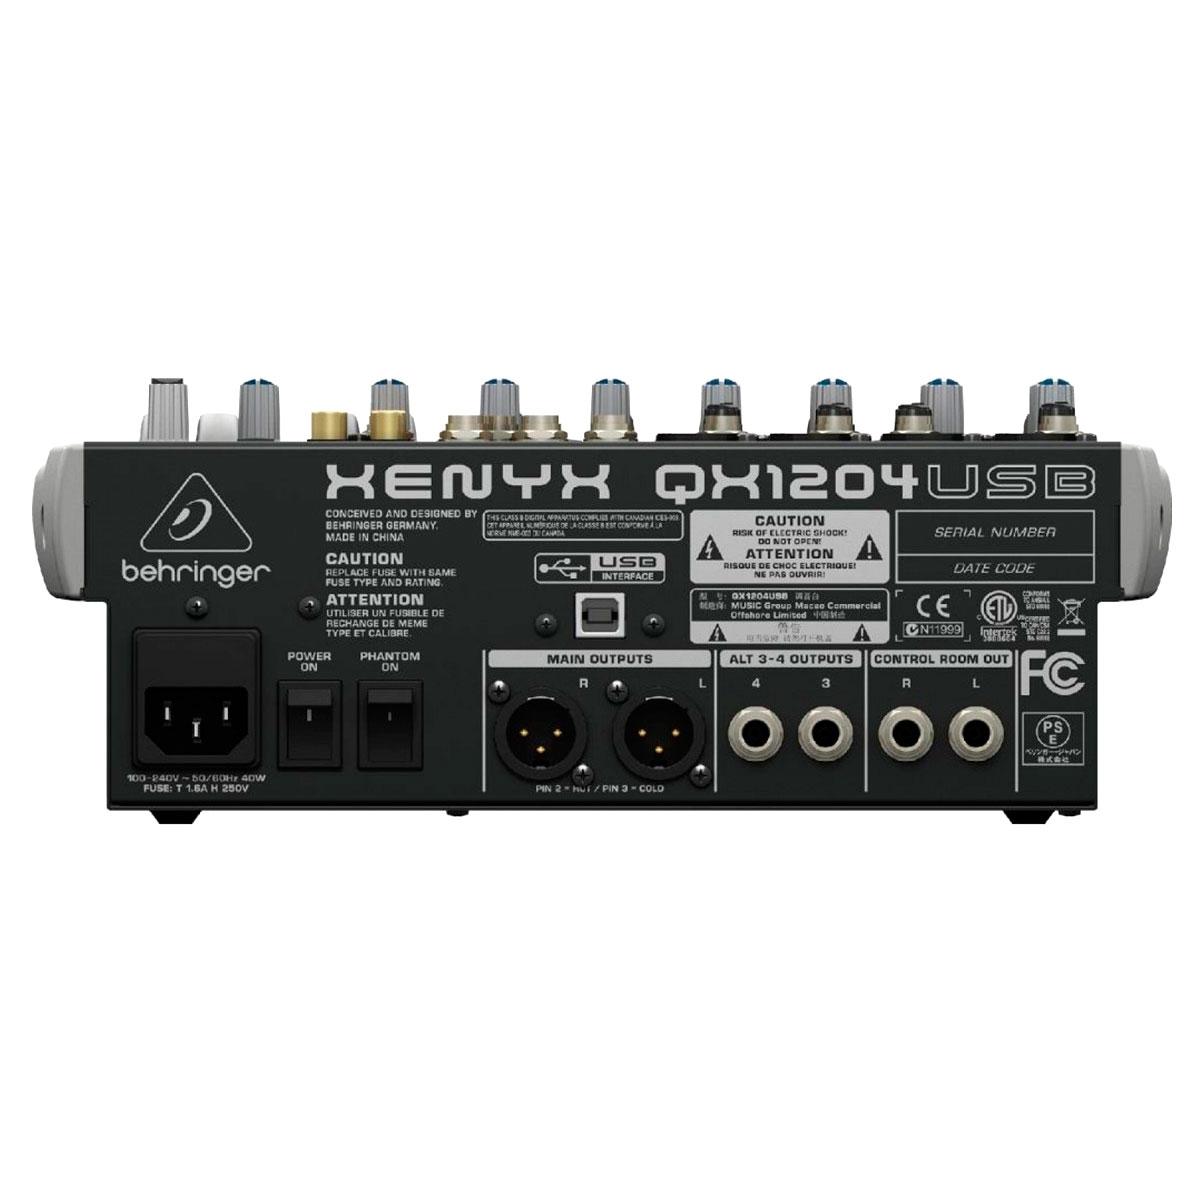 Mesa de Som 12 Canais Balanceados (4 XLR + 8 P10) c/ USB / Efeito / Phantom / 2 Auxiliares -Xenyx QX 1204 USB Behringer